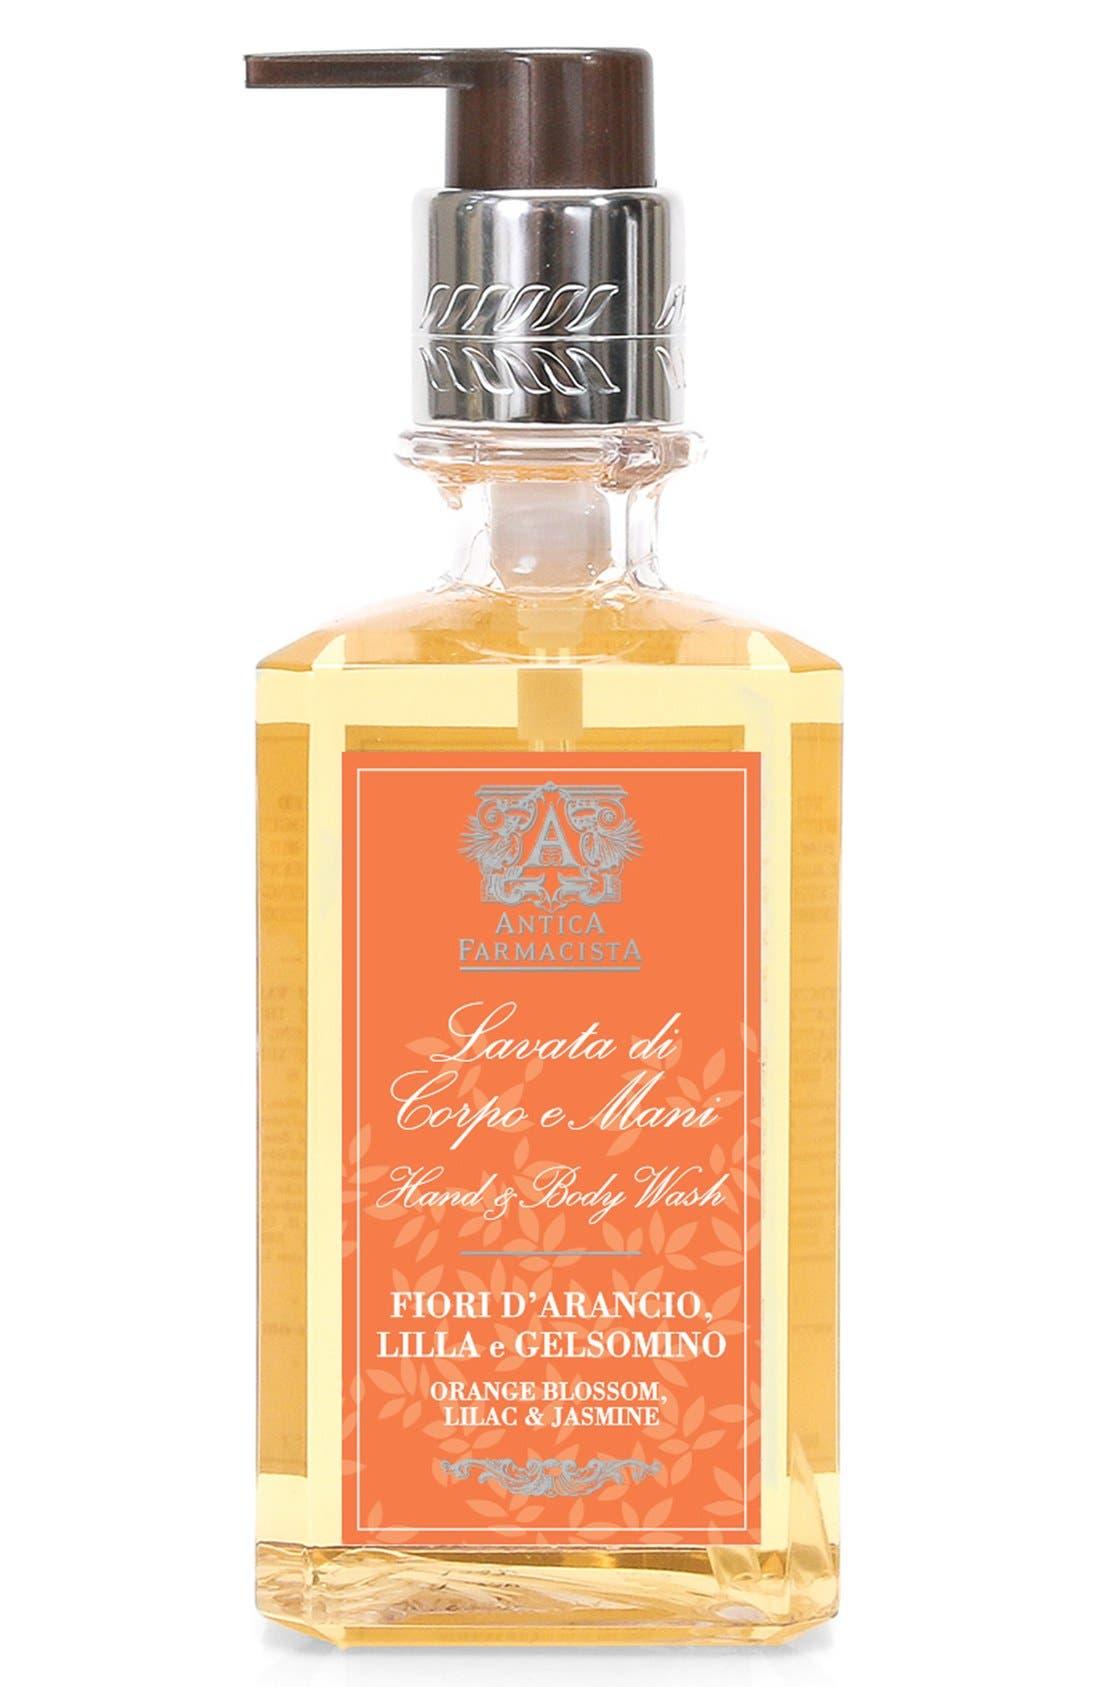 Antica Farmacista 'Orange Blossom, Lilac & Jasmine' Hand Wash